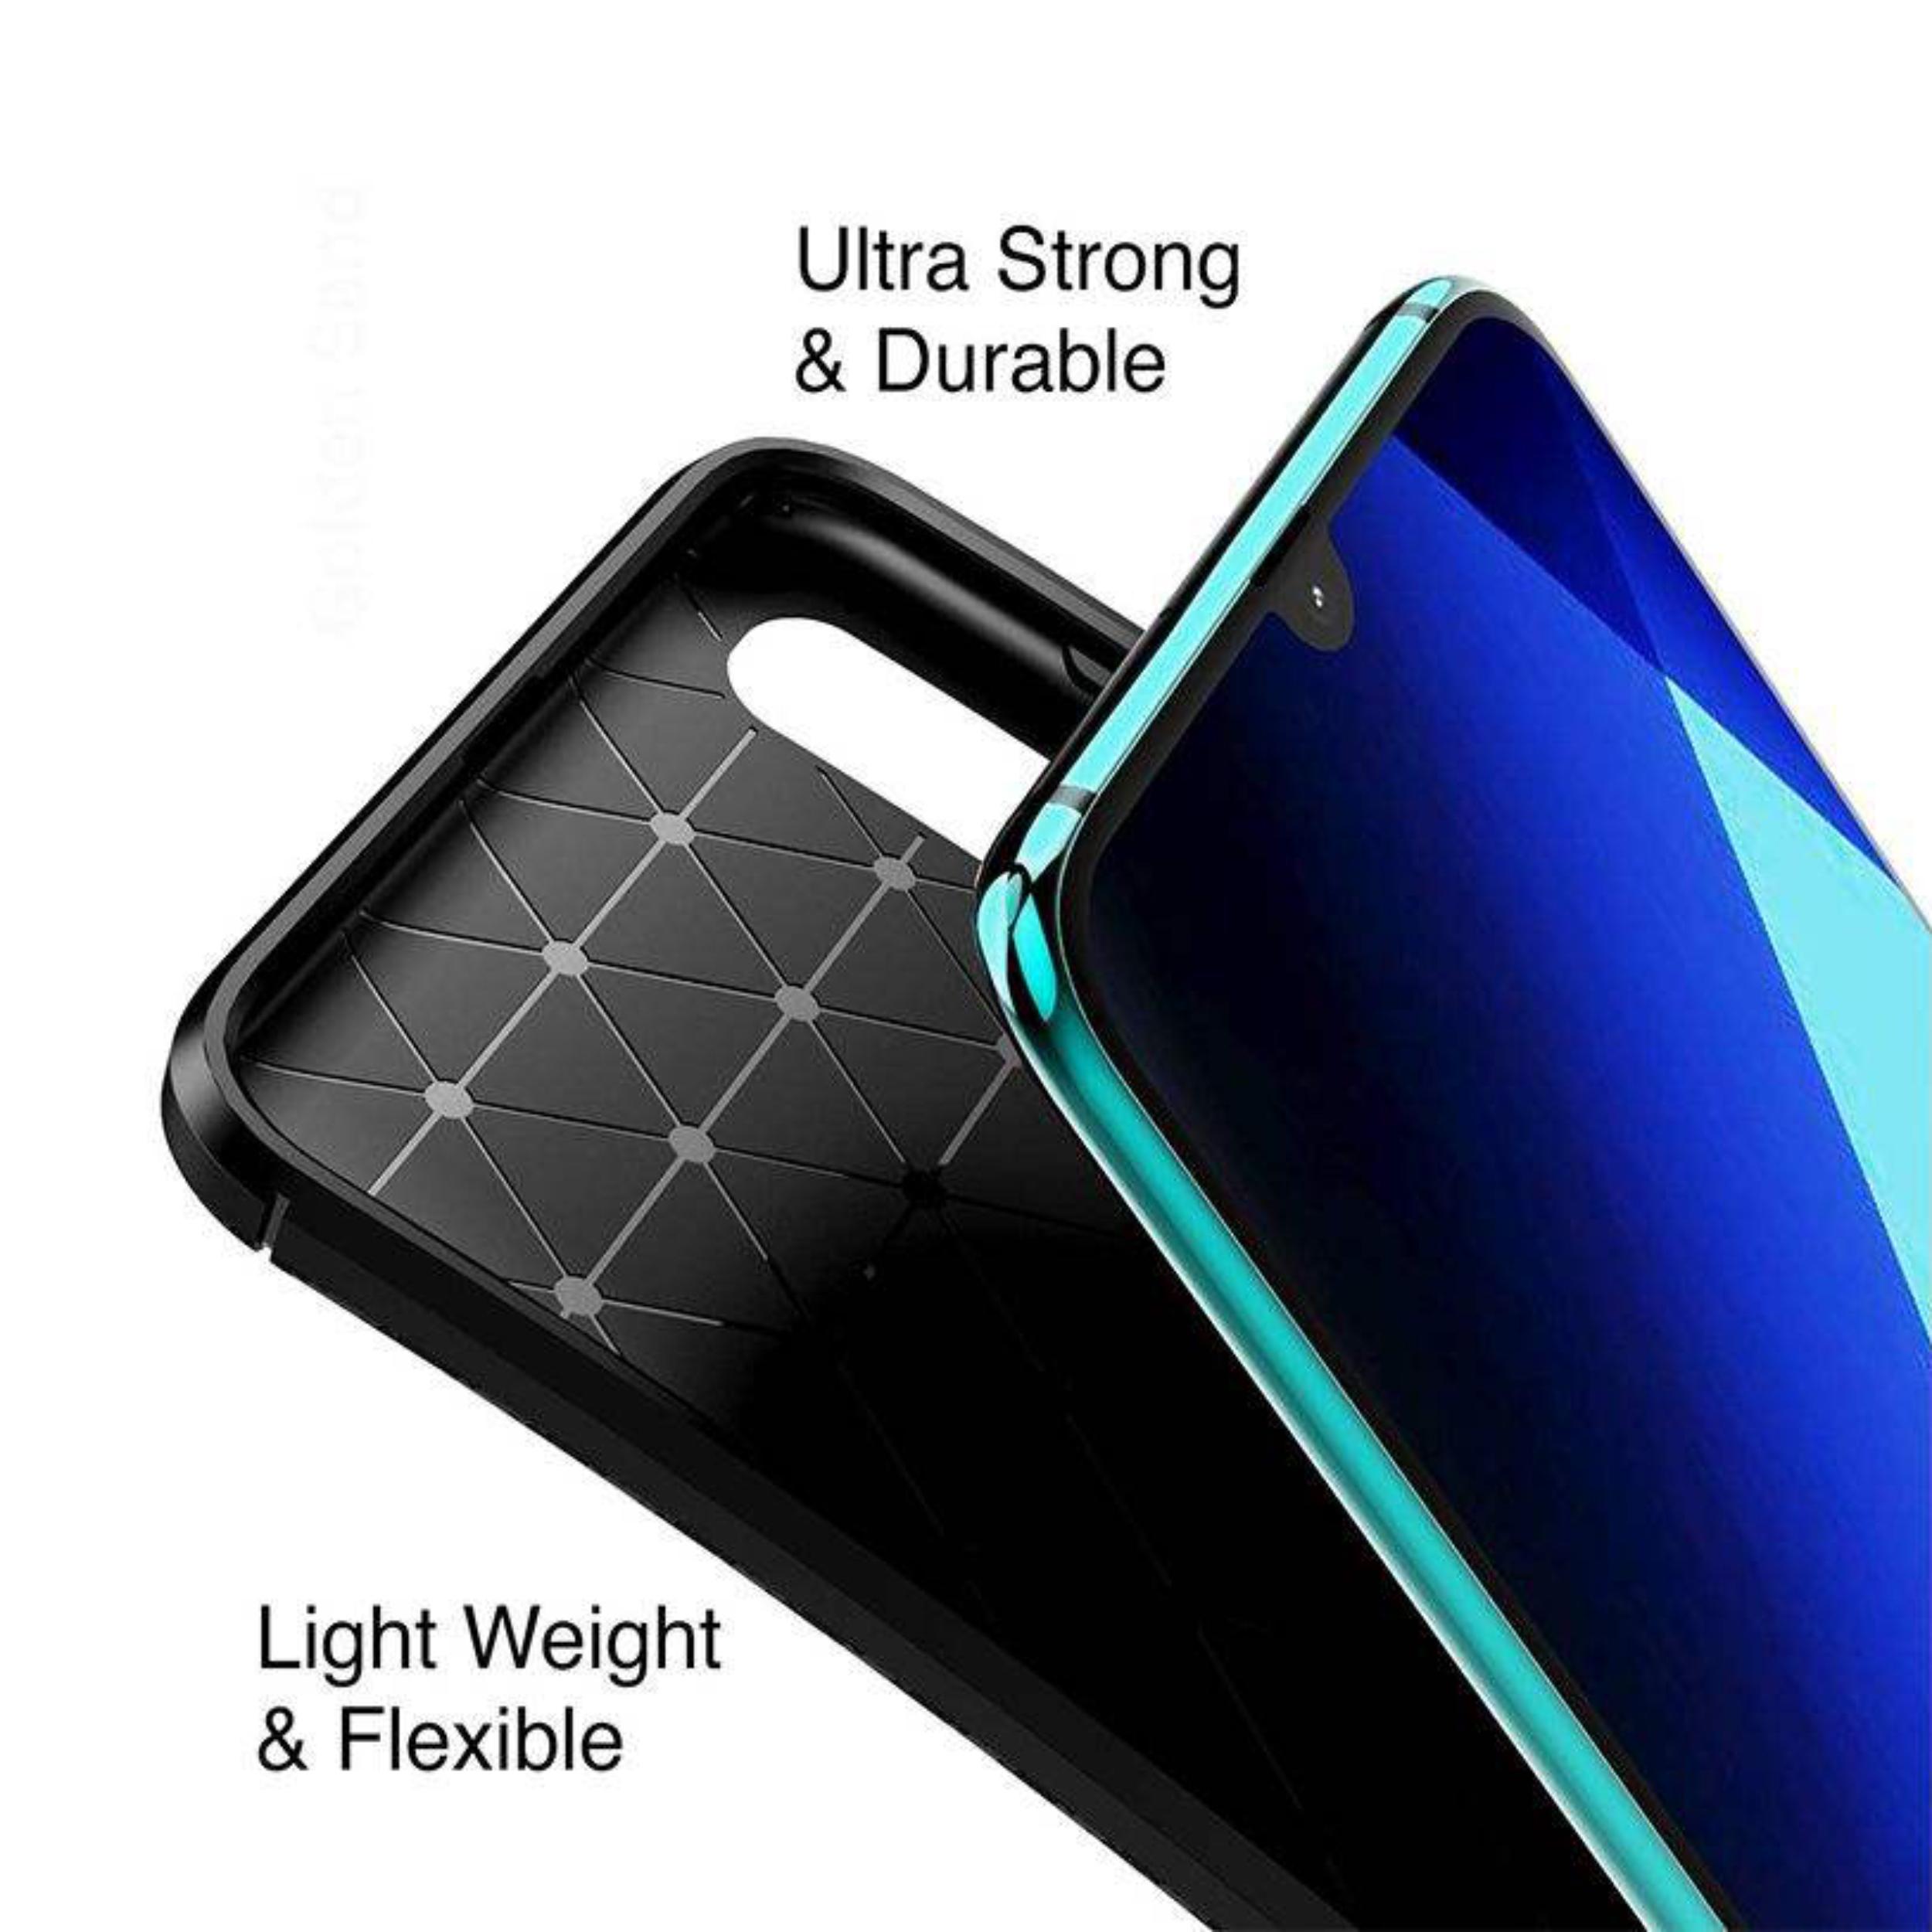 کاور لاین کینگ مدل A21 مناسب برای گوشی موبایل سامسونگ Galaxy A70/ A70S thumb 2 6